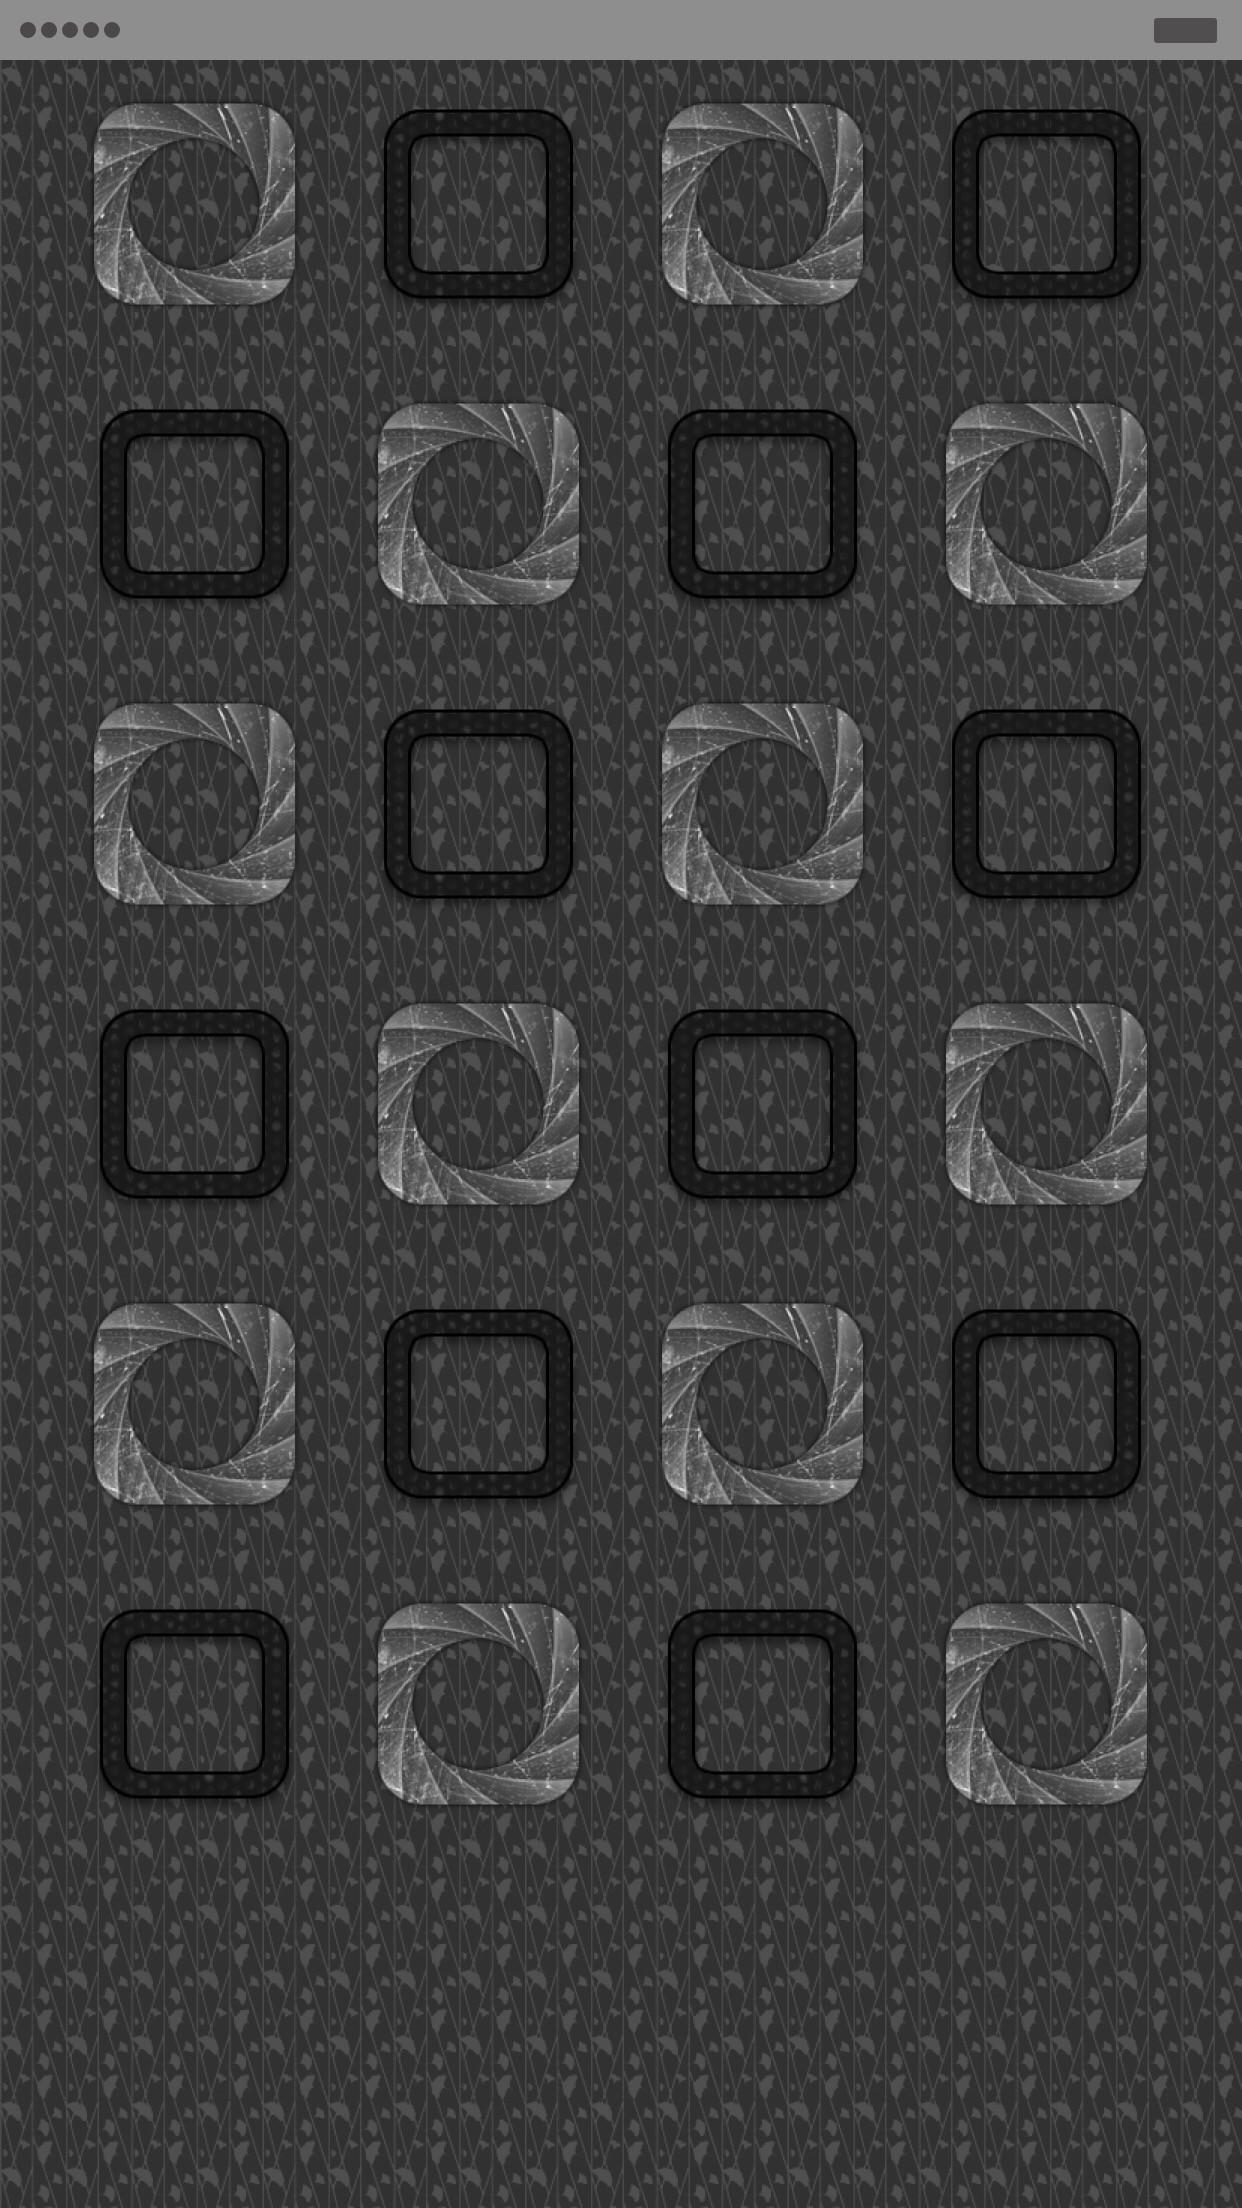 Phone Wallpapers, Iphone 6, Screens, Shelves